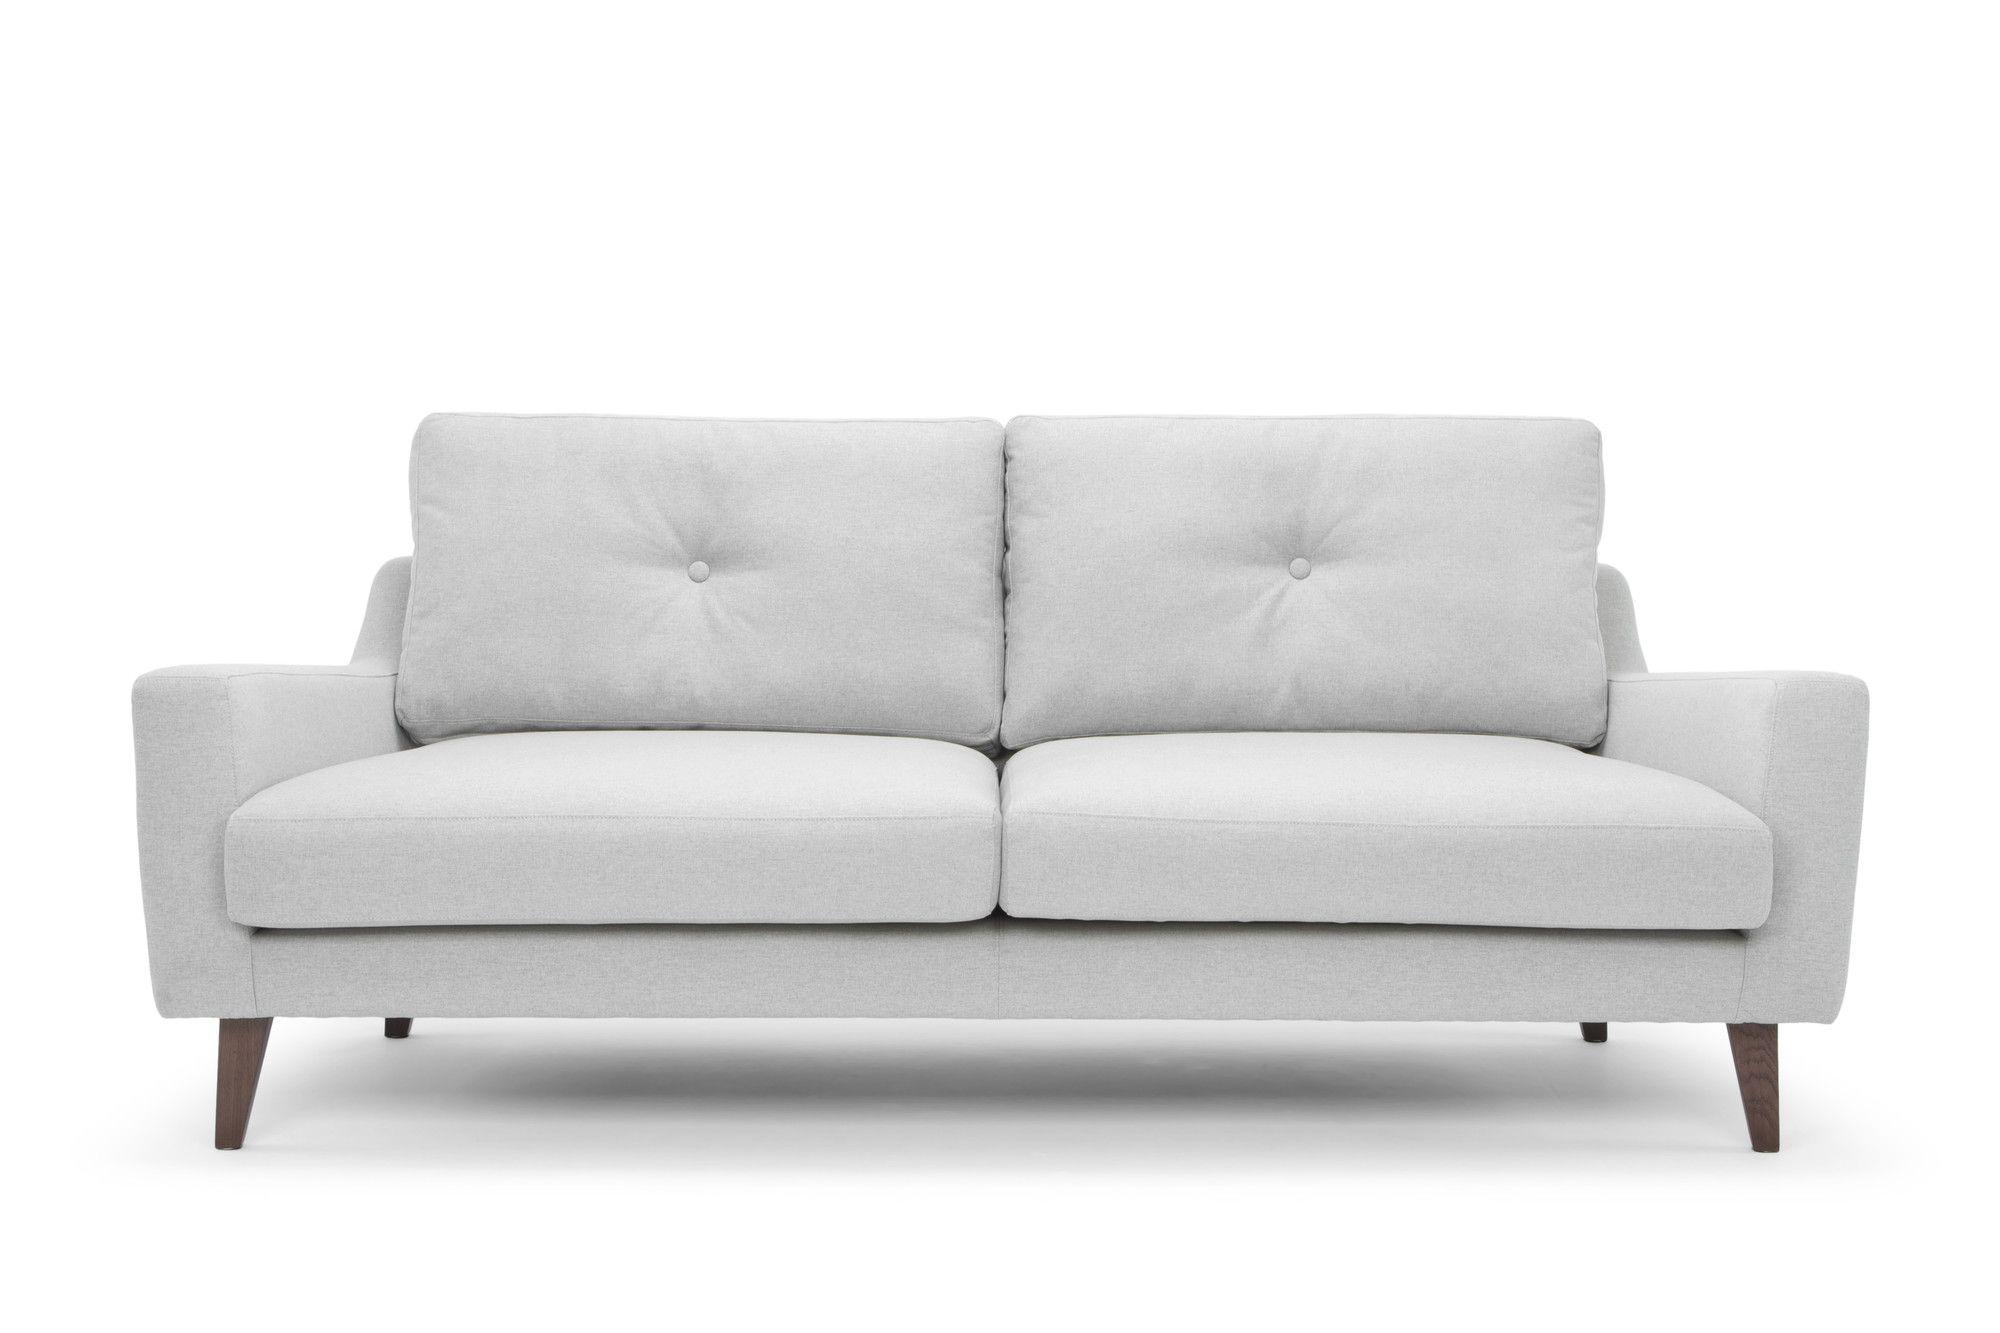 Retro Modern Sofa In Viktor Retro Modern Sofa Products Pinterest